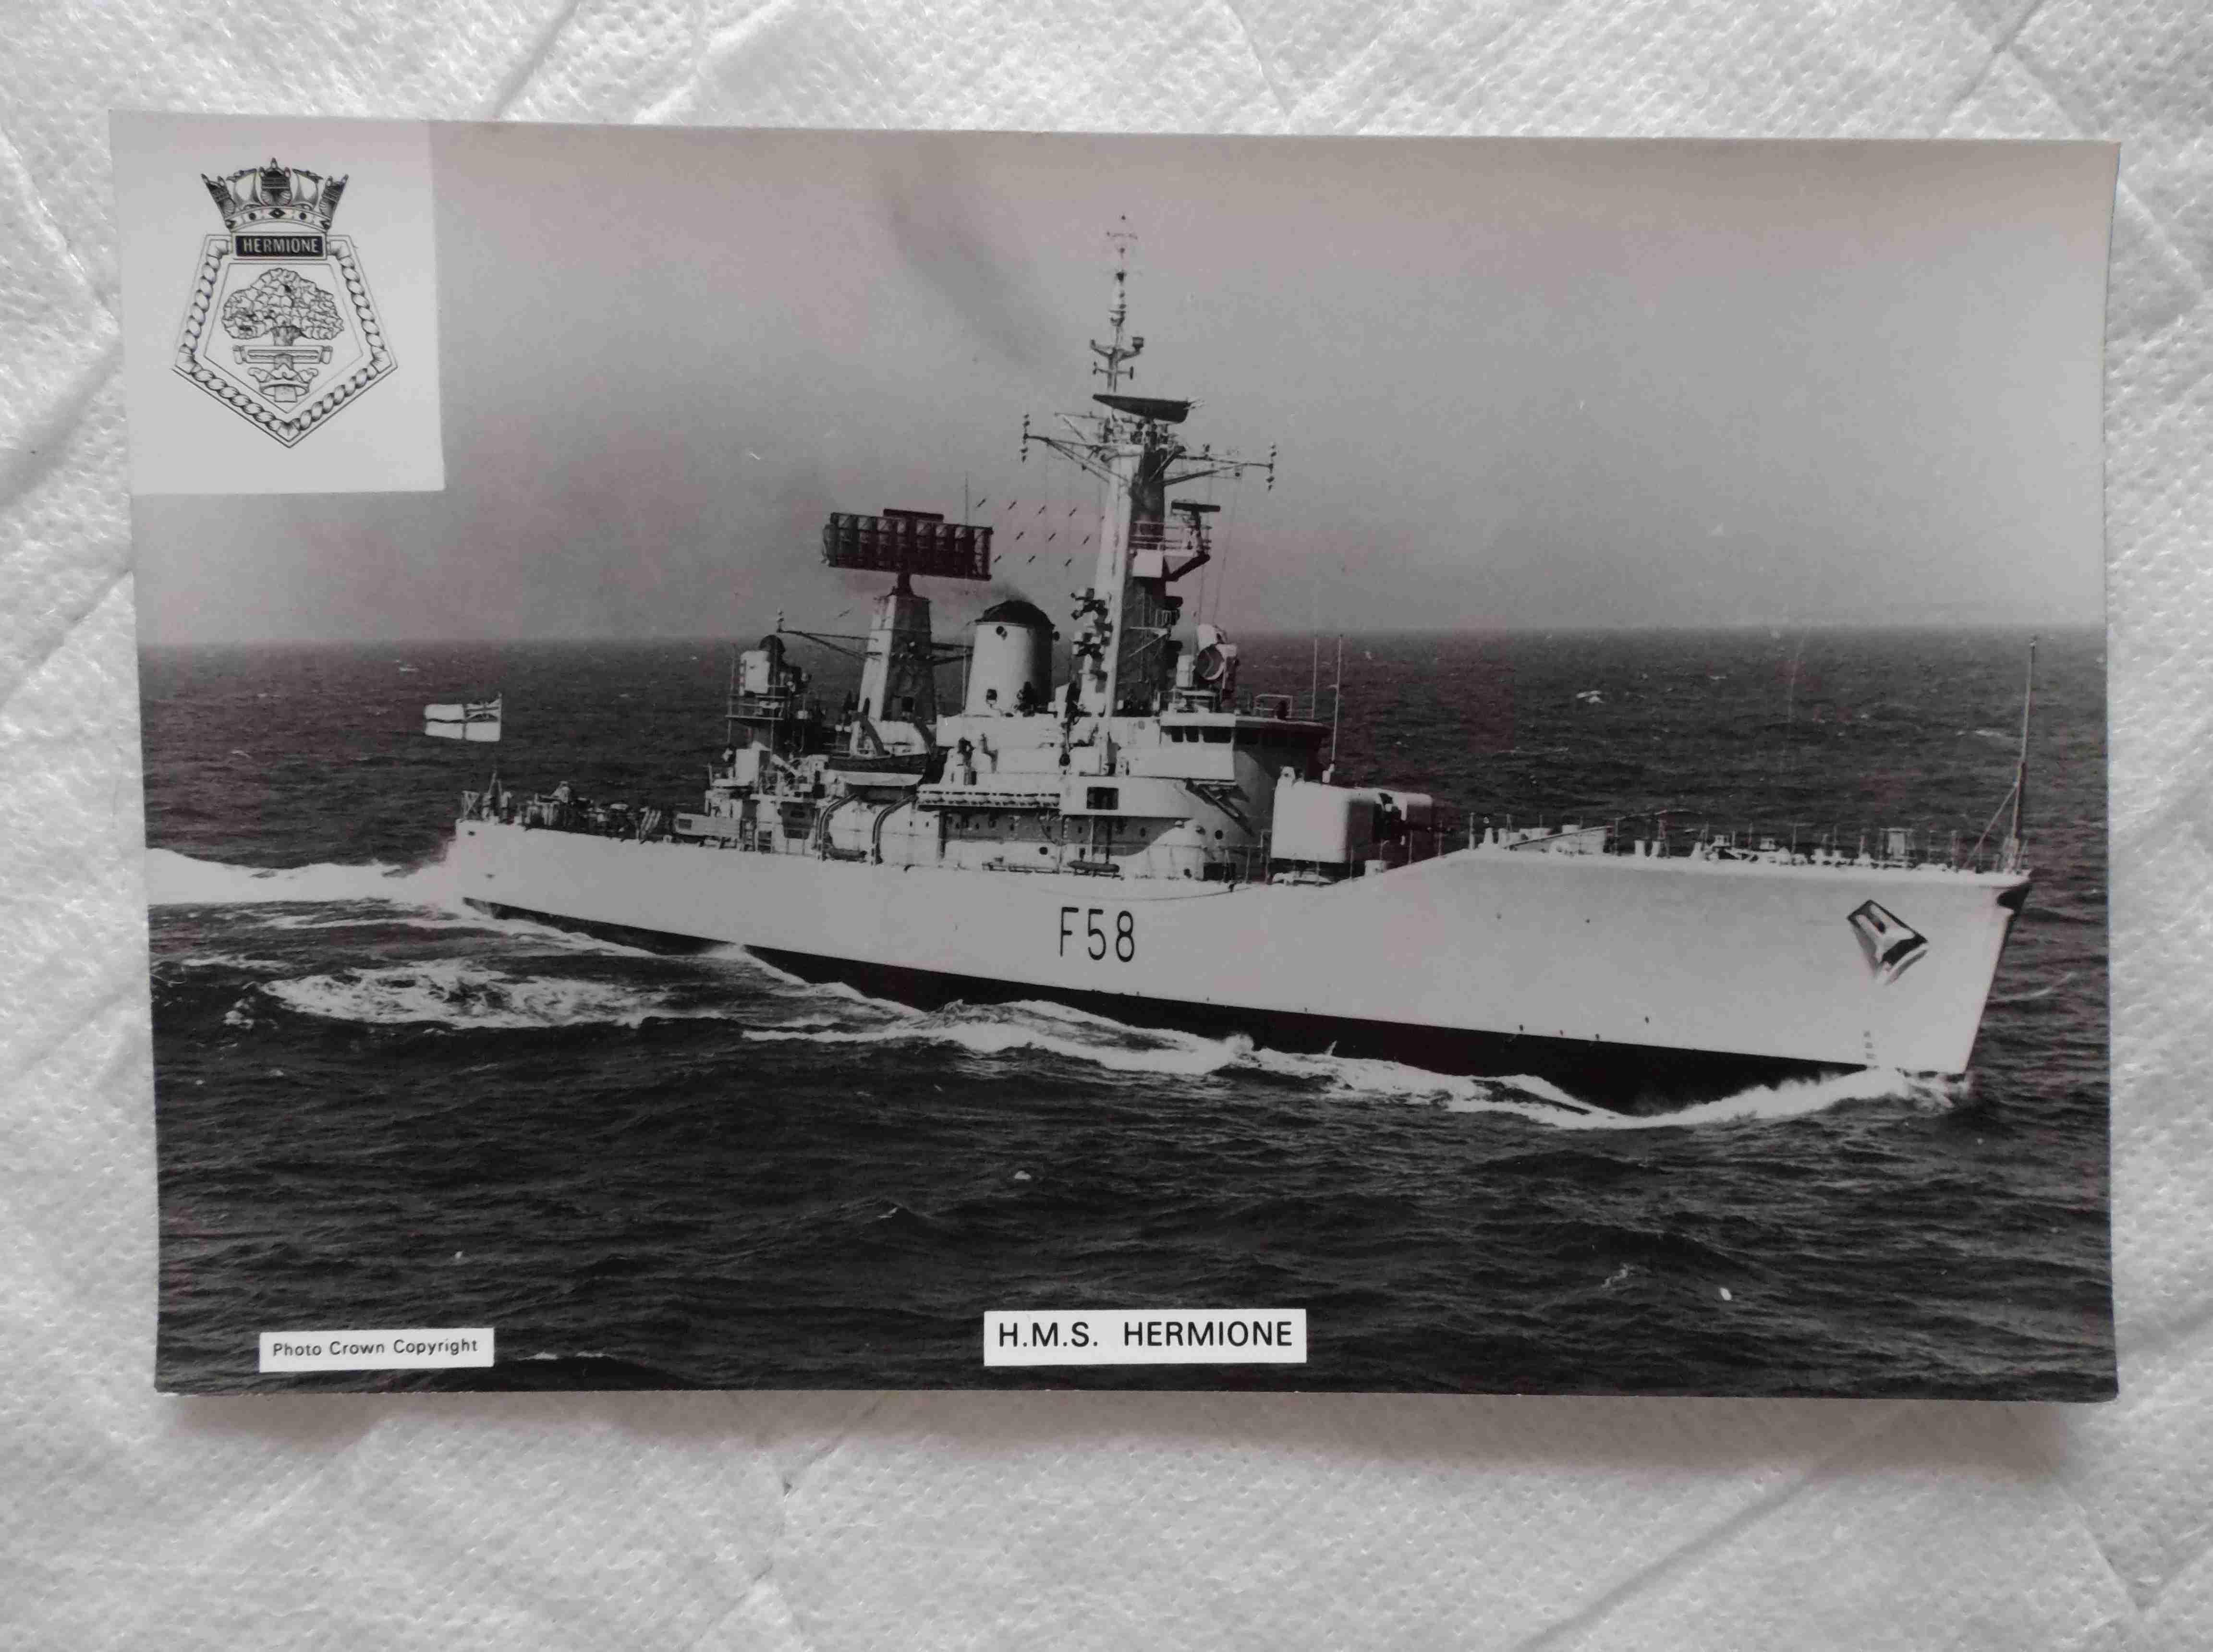 POSTCARD SIZE PHOTOGRAPH OF THE ROYAL NAVAL VESSEL HMS HERMIONE